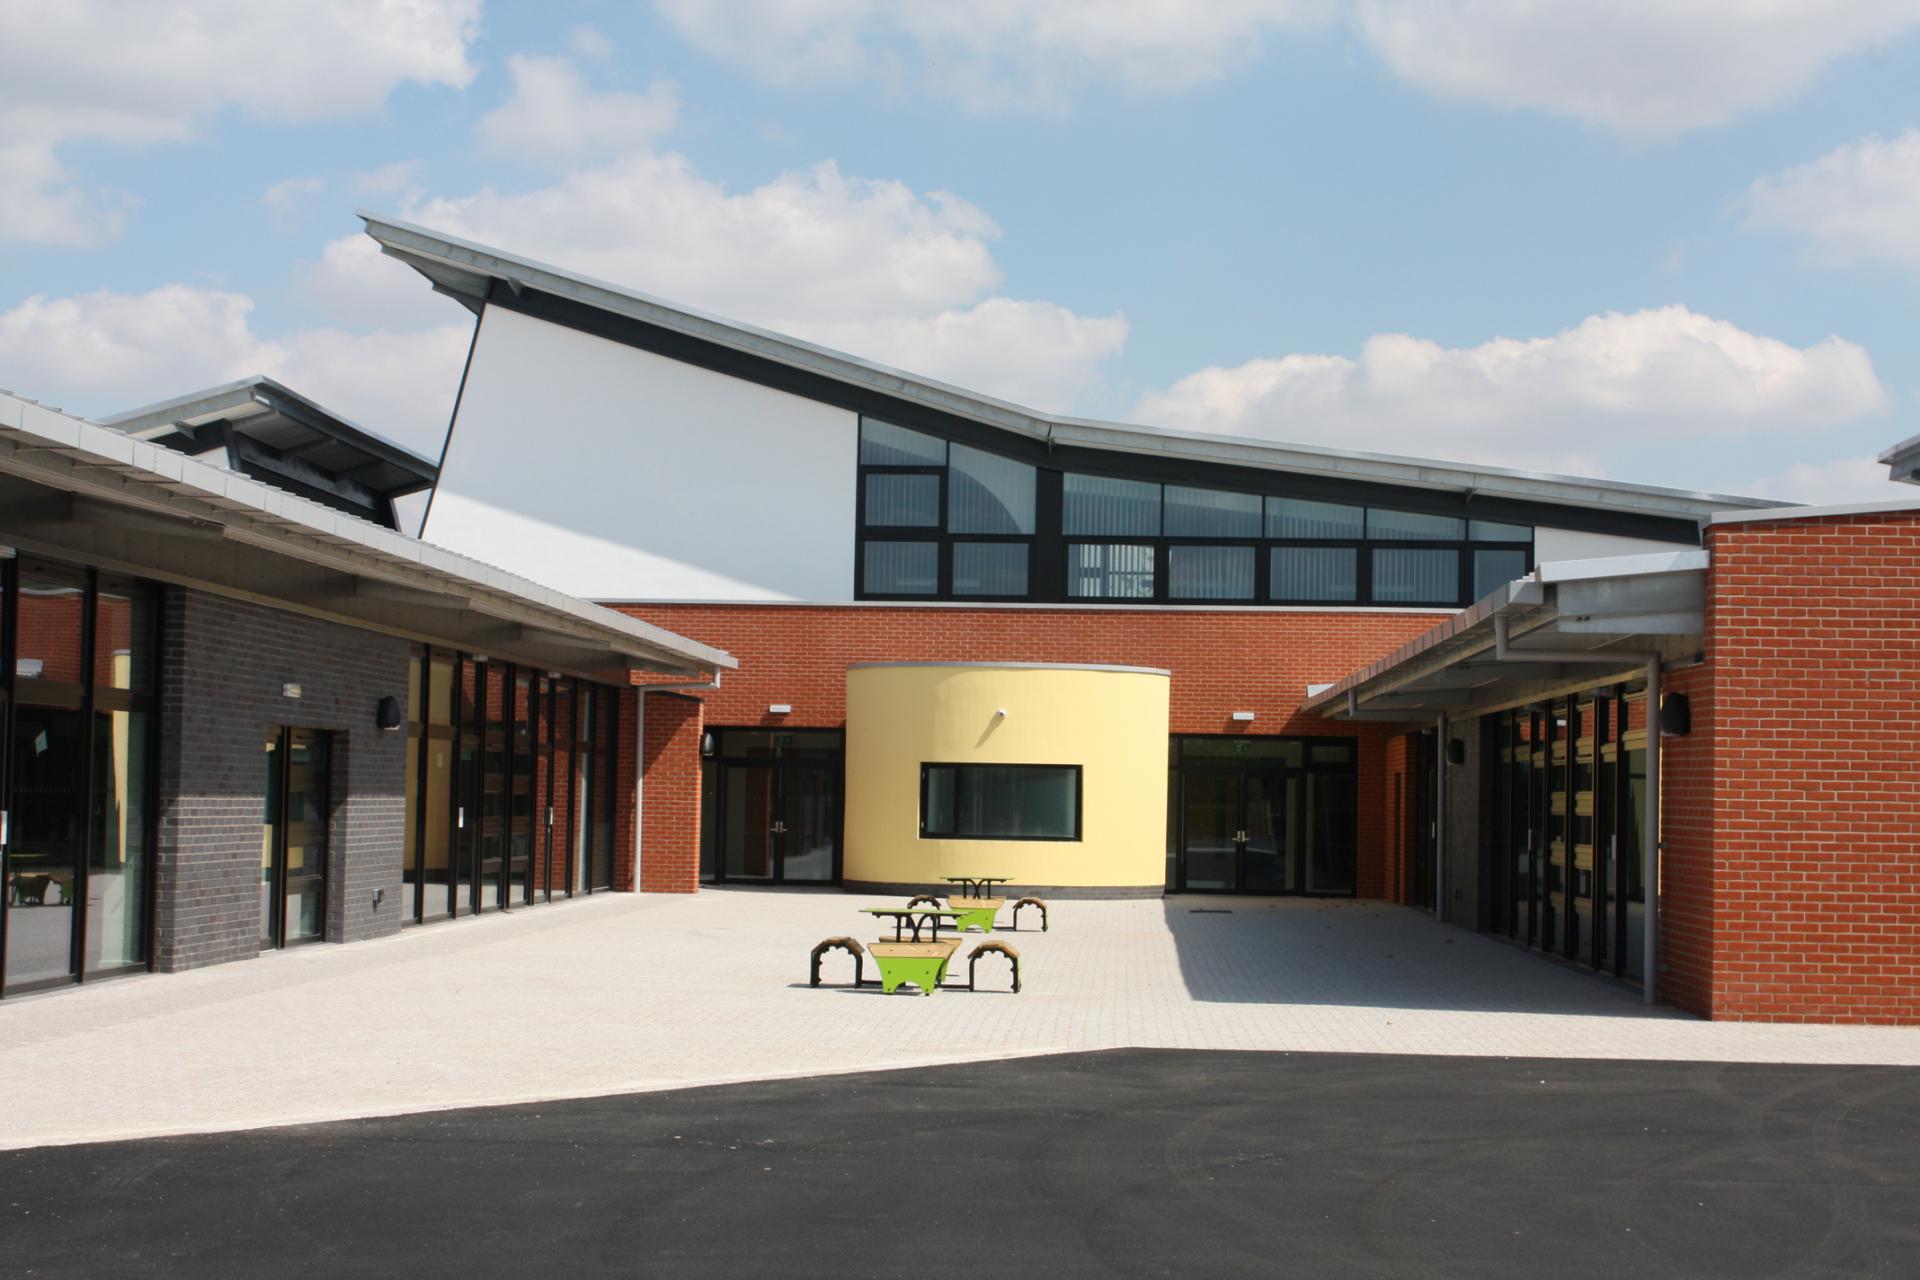 COLESHILL HEATH SCHOOL